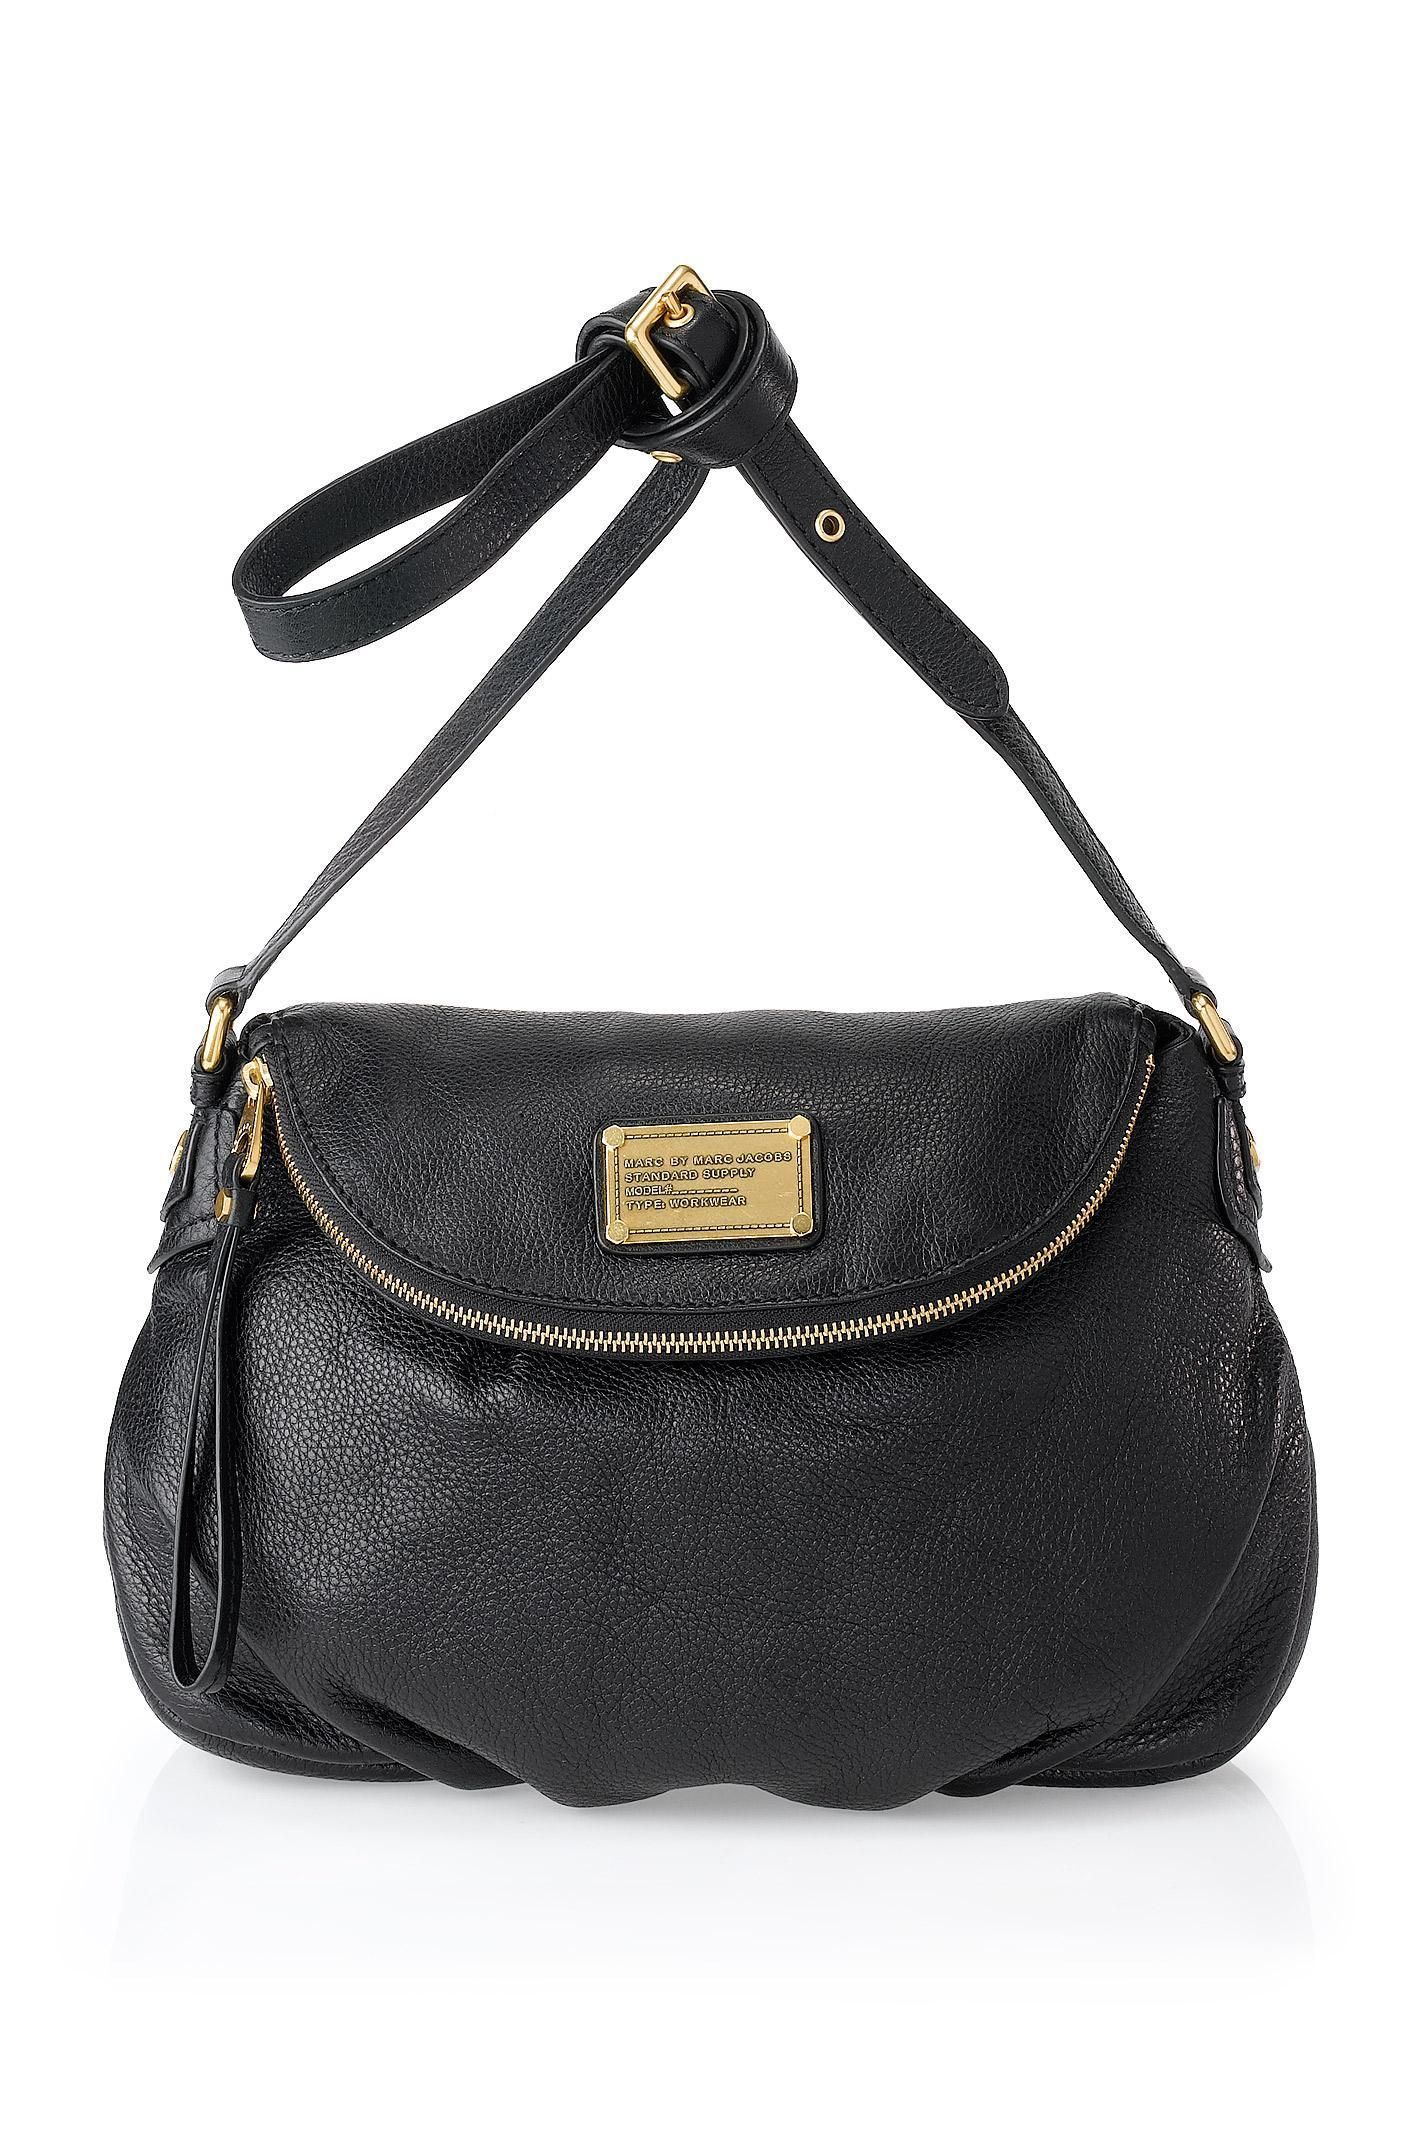 be337d7a4f27 Classic Q Natasha. Classic Q Natasha Leather Handbags